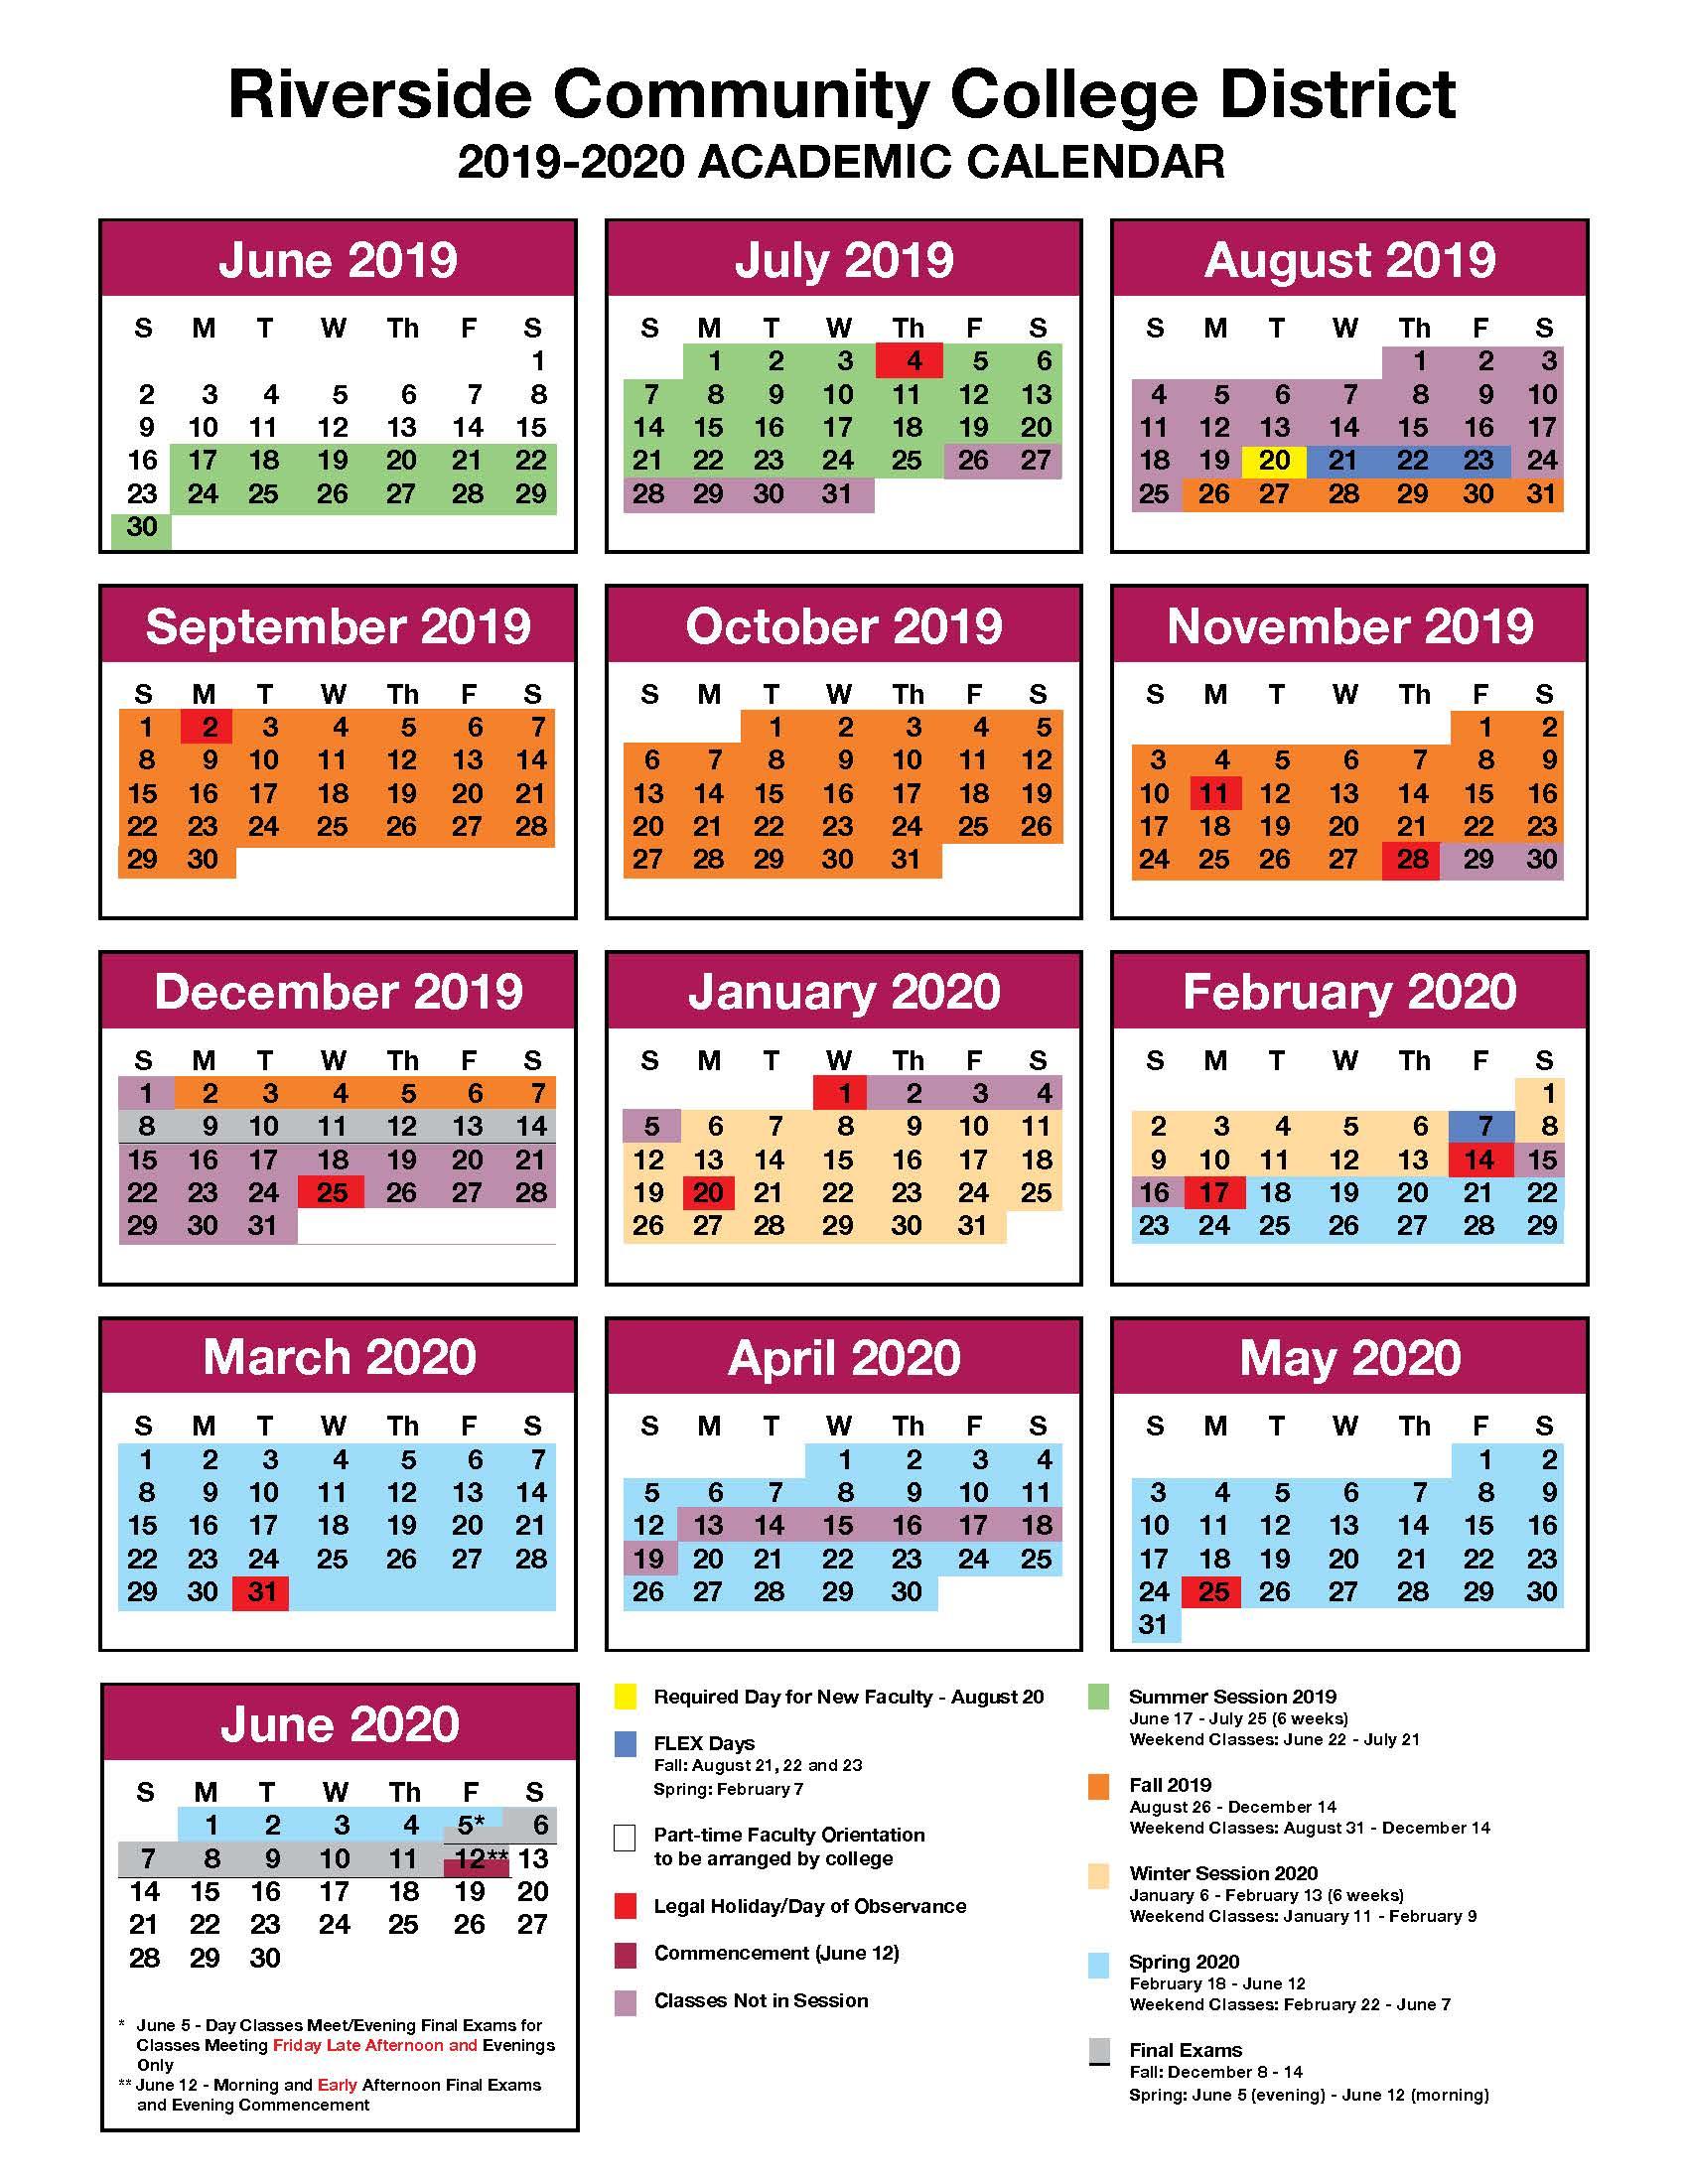 Jfk And Norco College Calendar 2019 2020 - John F. Kennedy Pertaining To Corona Norco Usd School Calendar